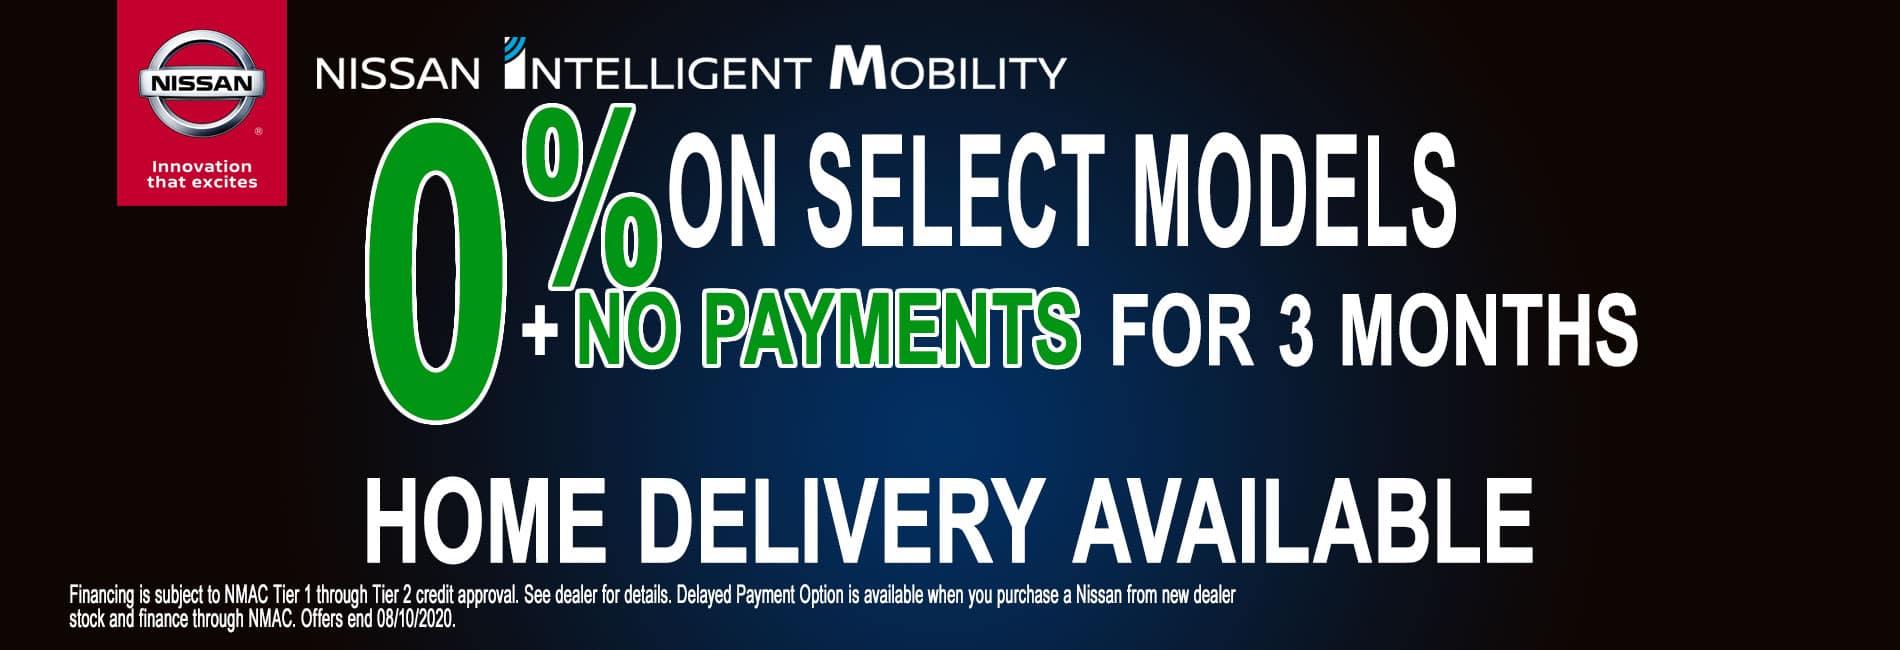 Get Zero Percent APR financing on Select Models